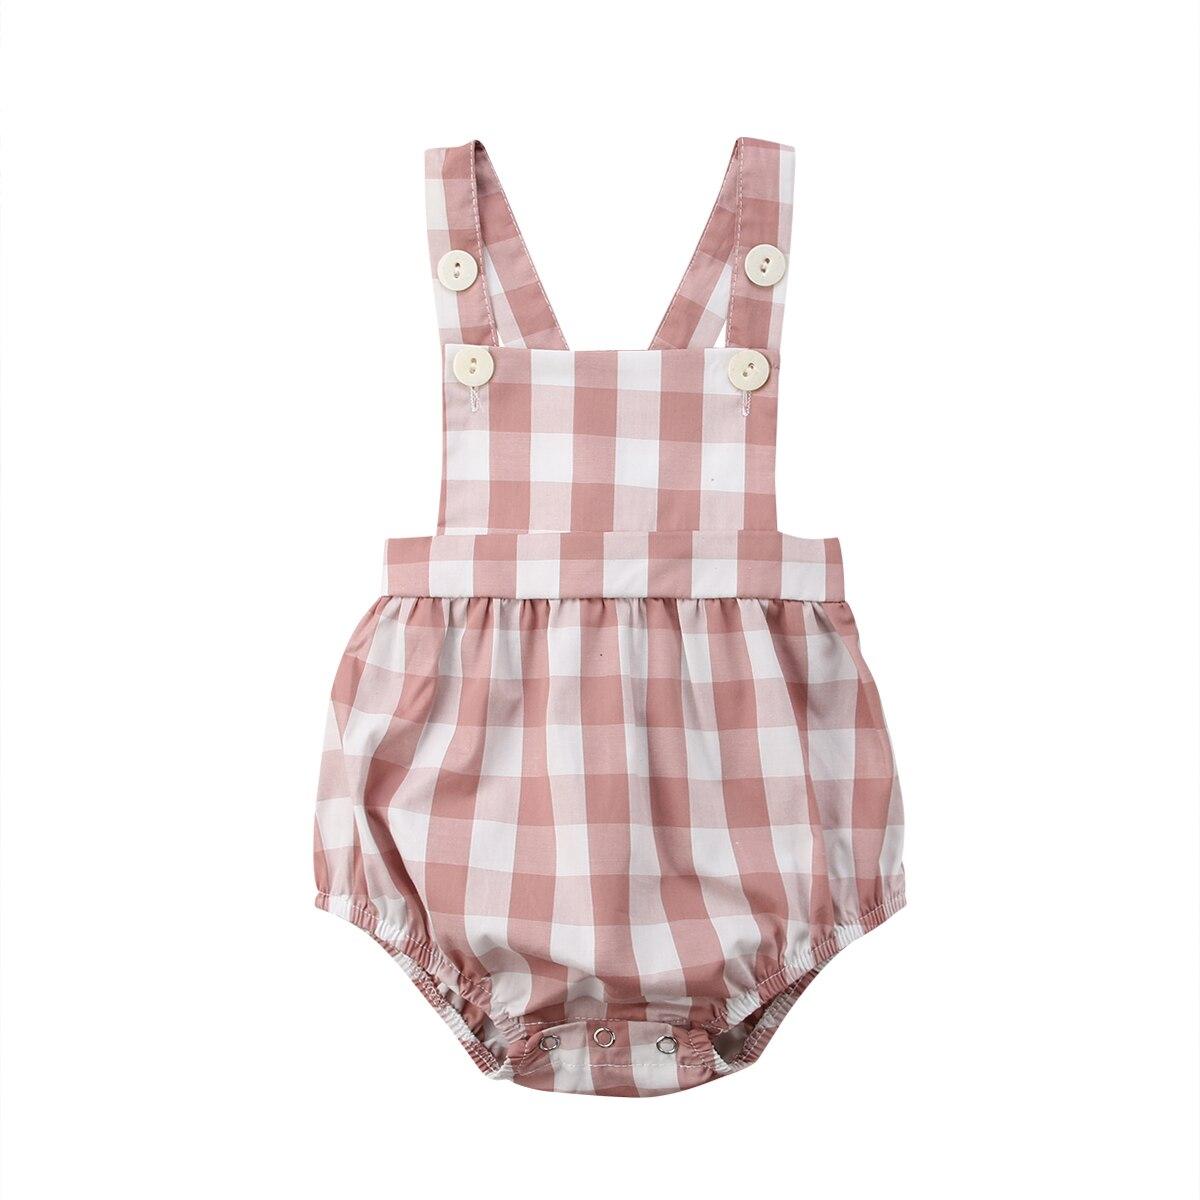 0-18 M Peuter Baby Meisjes Mouwloze Plaid Romper Katoen Pasgeboren Meisjes Jumpsuit Overalls Baby Meisjes Kleding Zomer